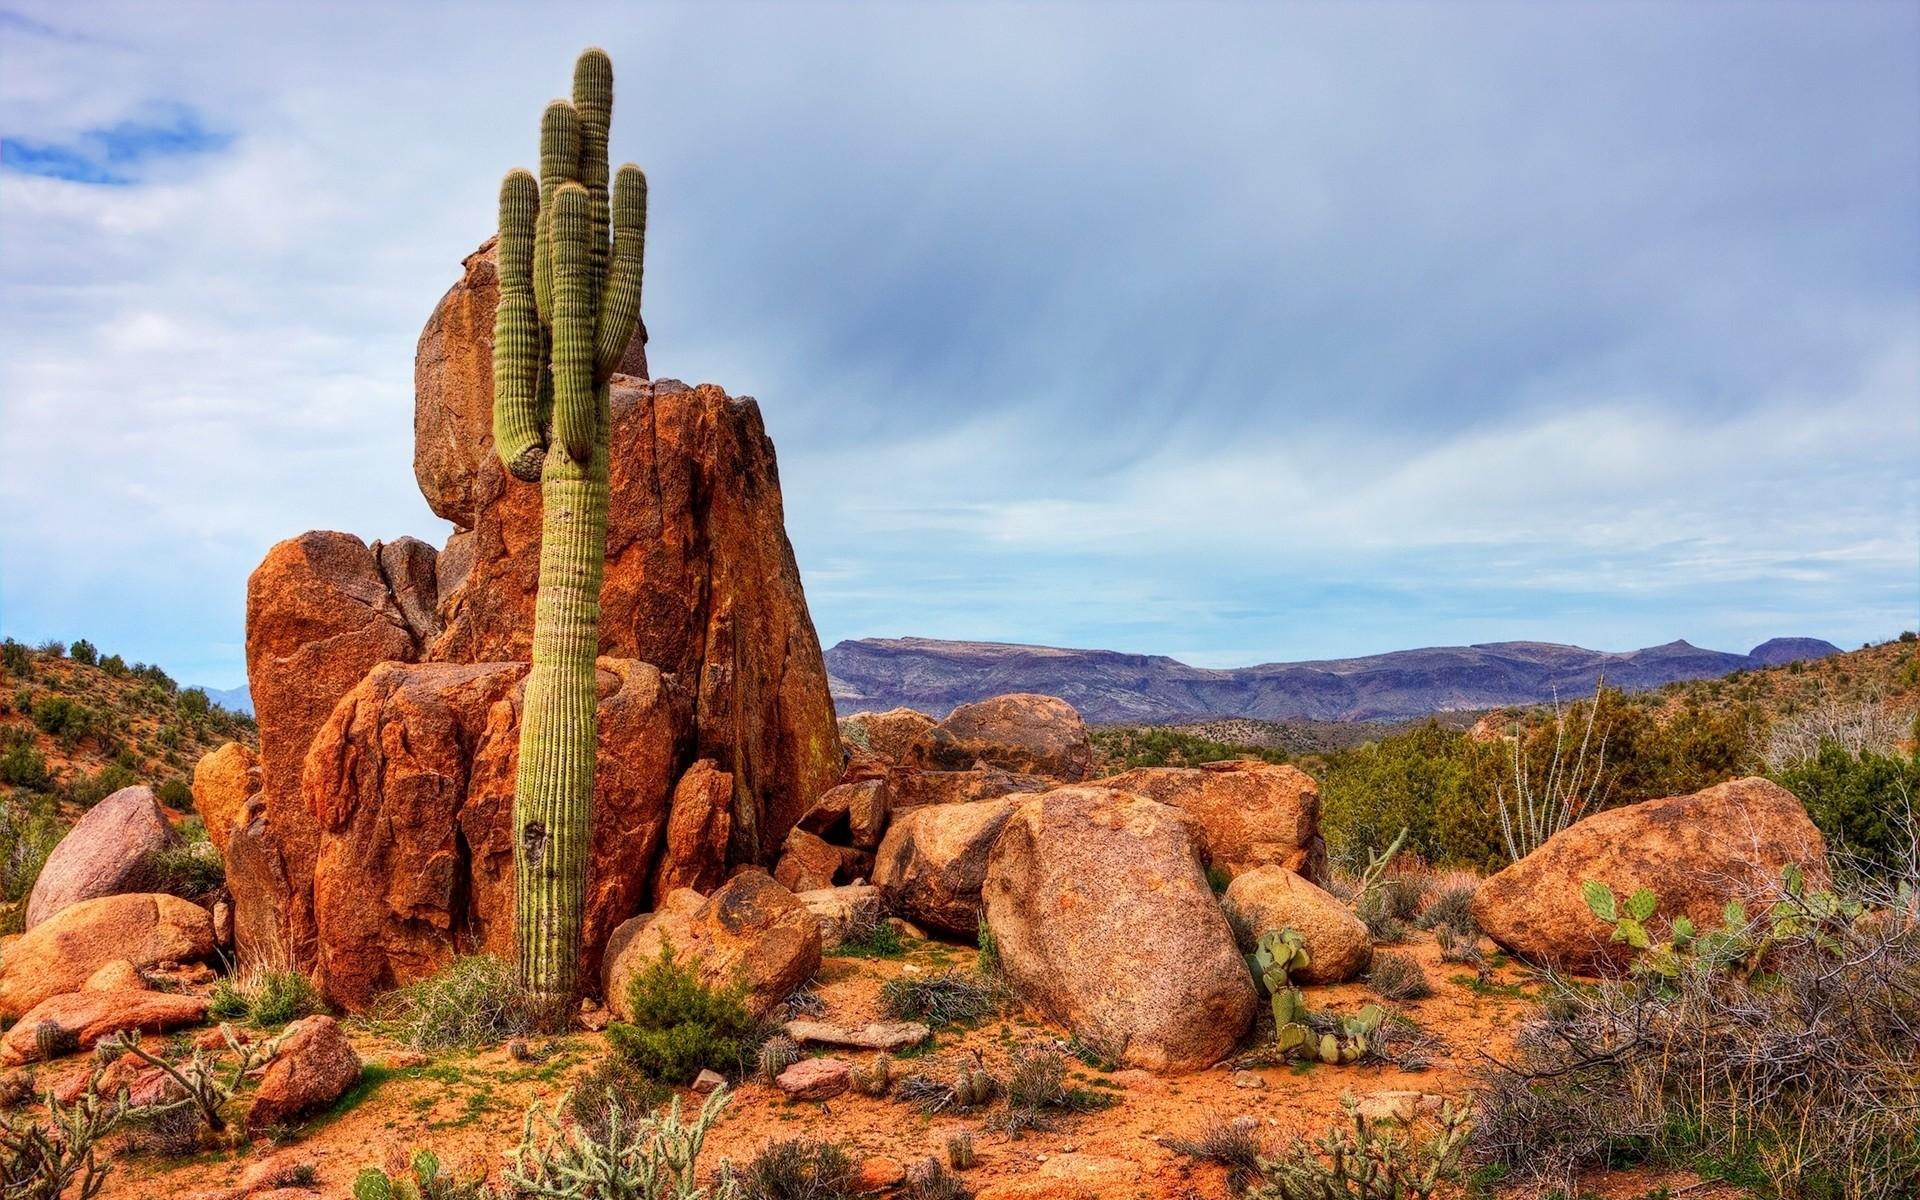 desert wallpaper cactus hd - photo #43